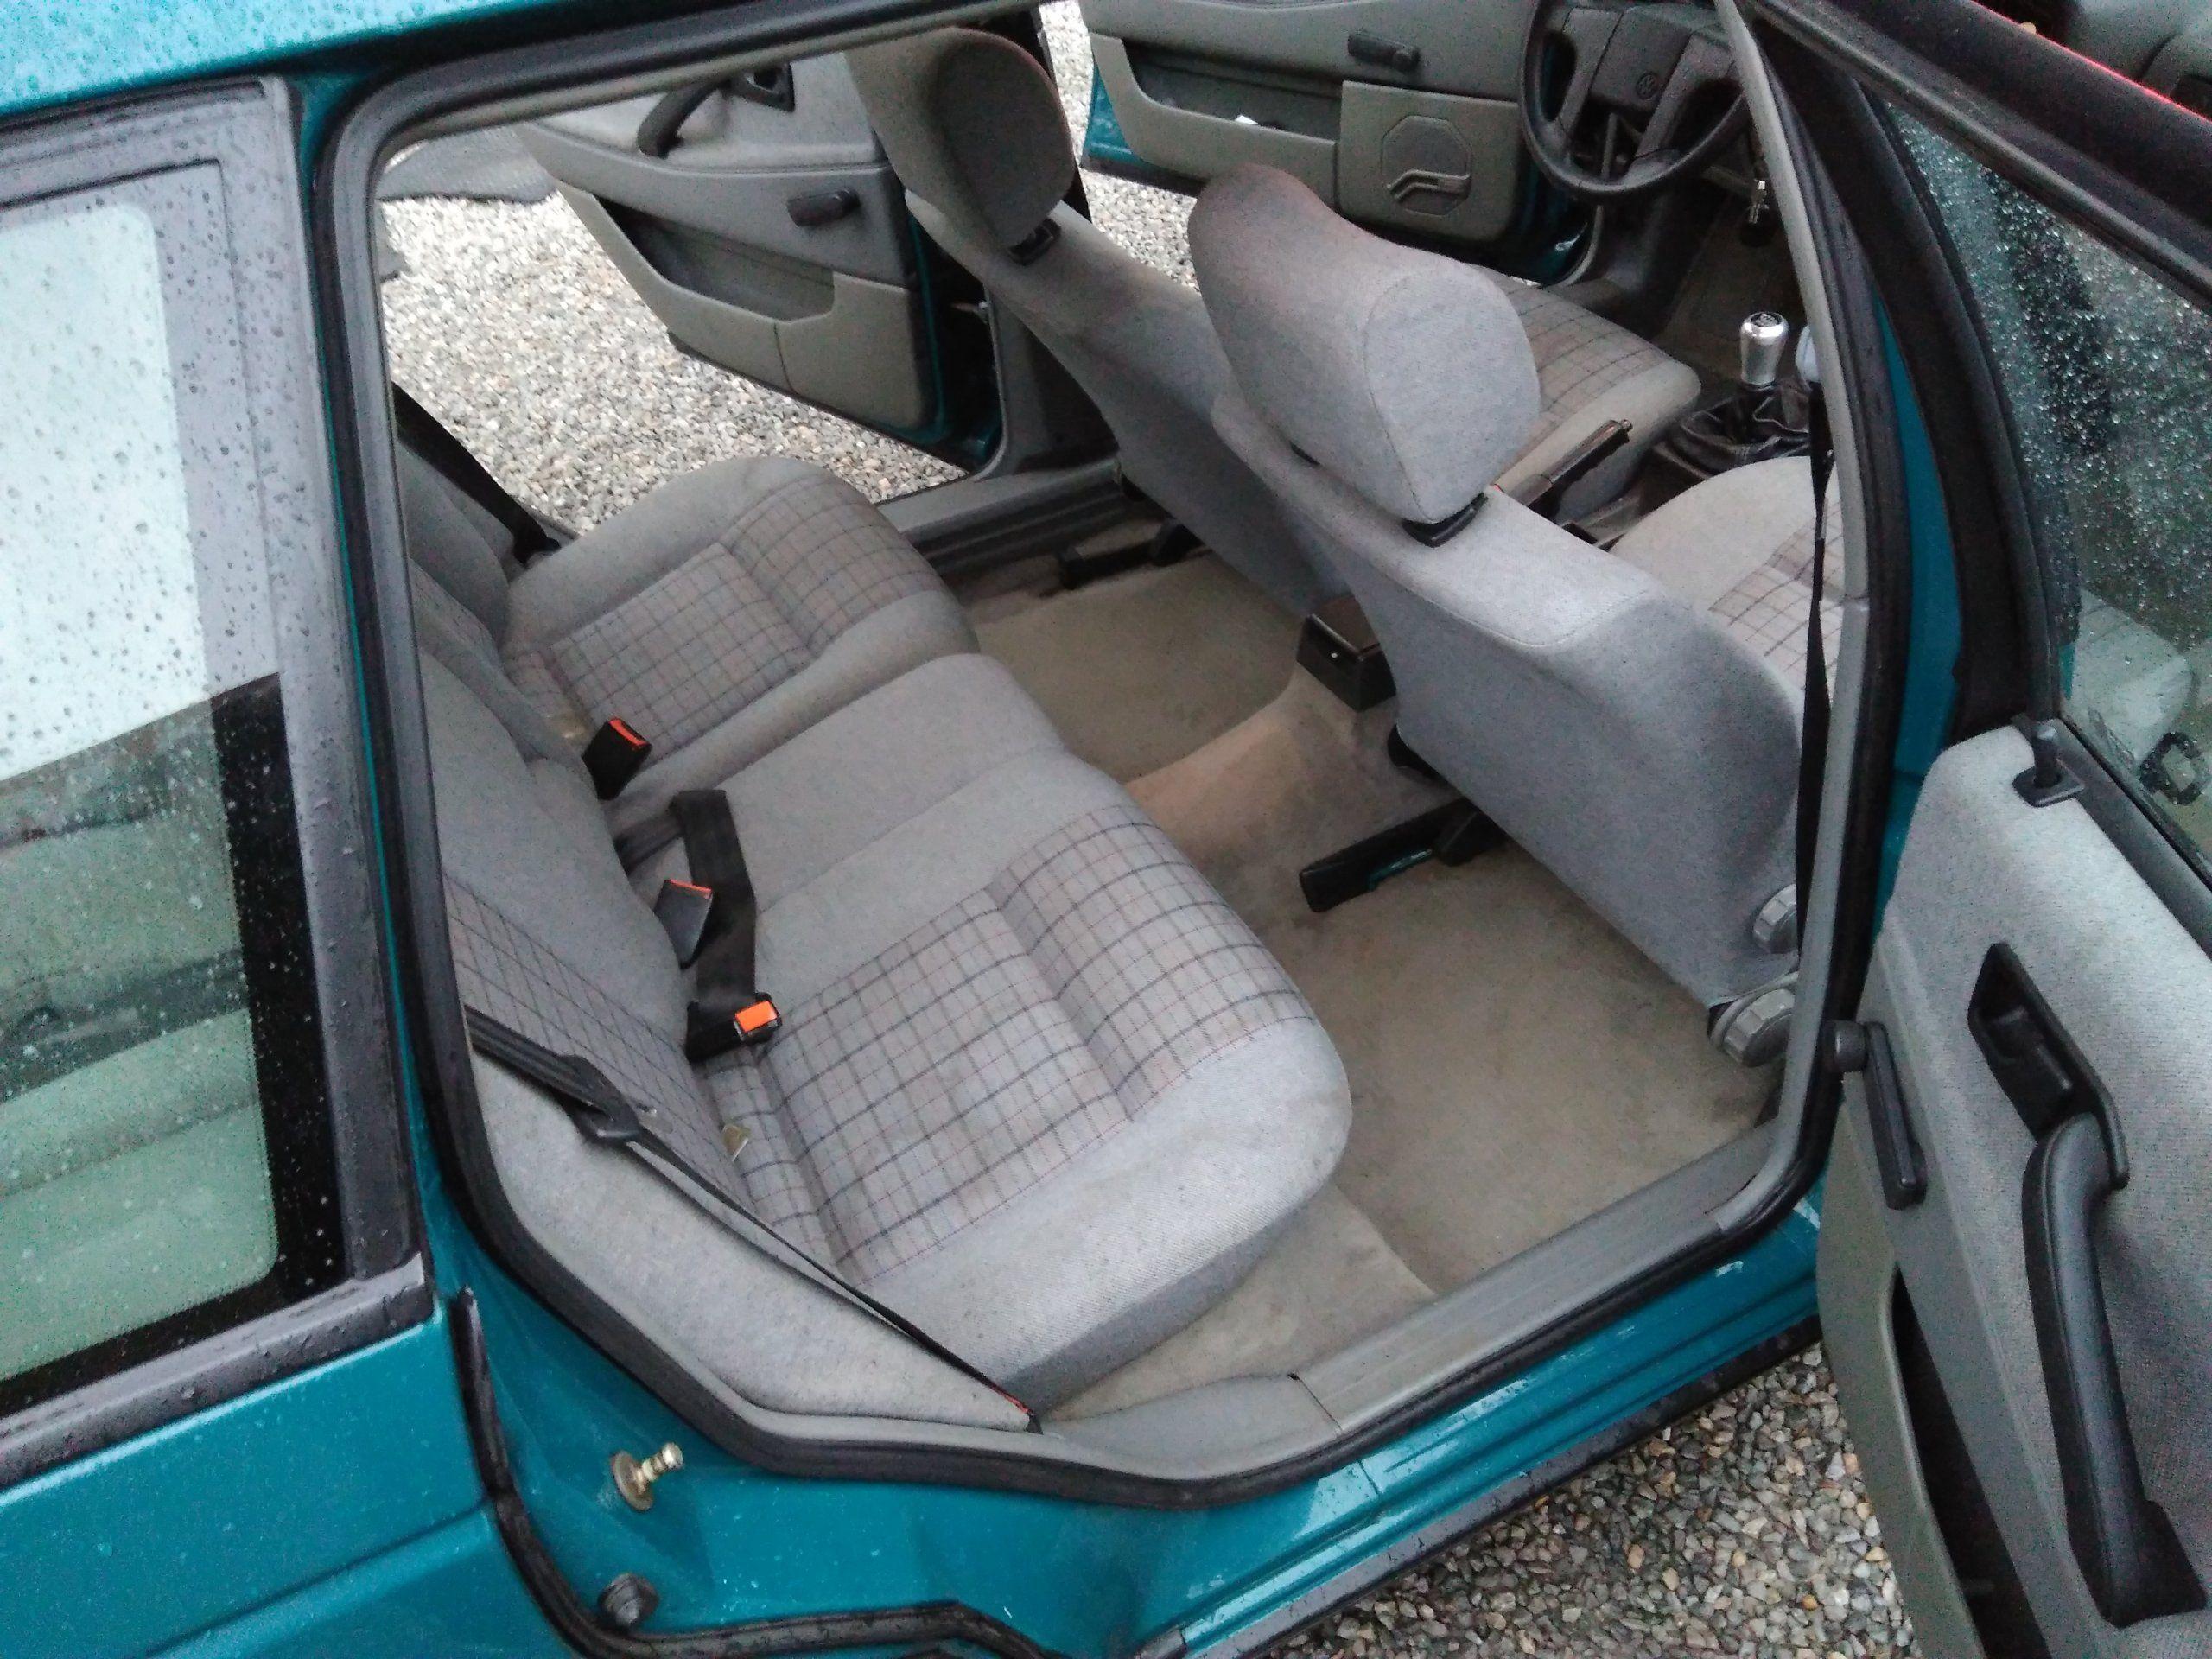 Wolksvagen Passat B3 Vr6 7242035298 Oficjalne Archiwum Allegro Vw Passat Volkswagen Passat Car Seats